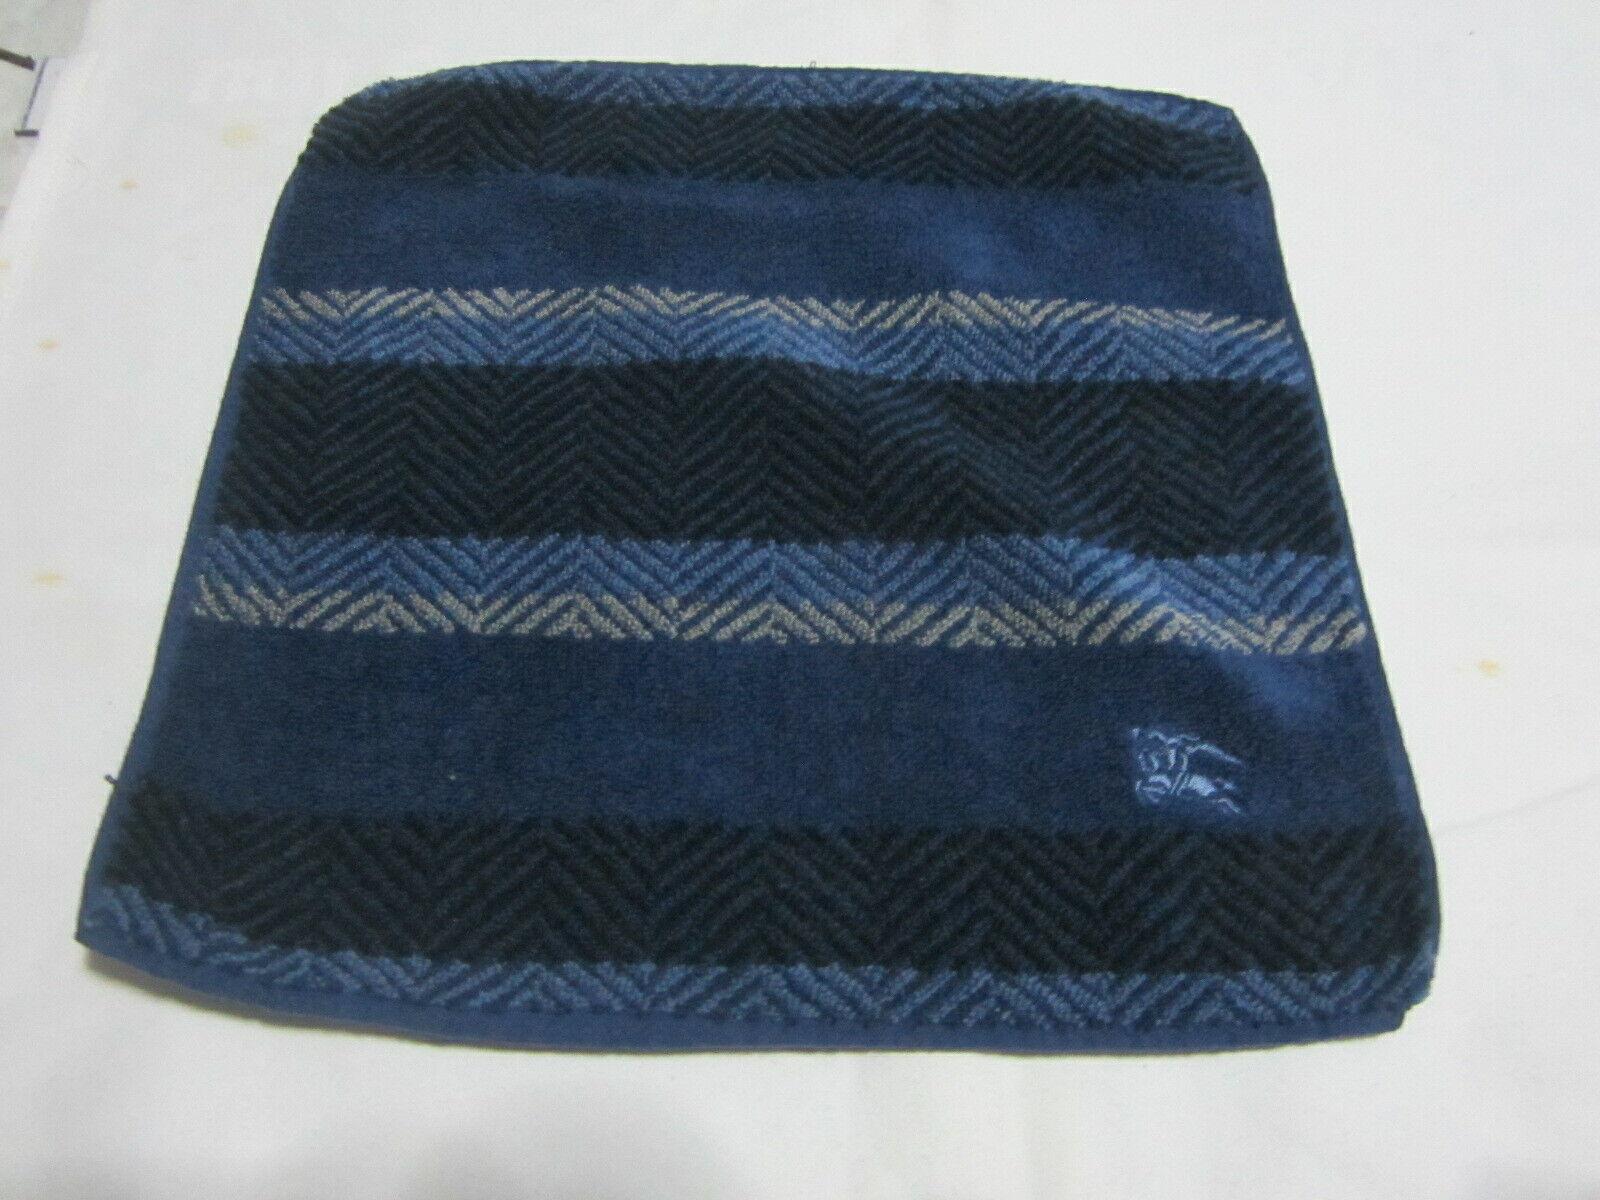 Used Small Face Towel Flannel Wash Cloth Designer Blue Nova Check 12